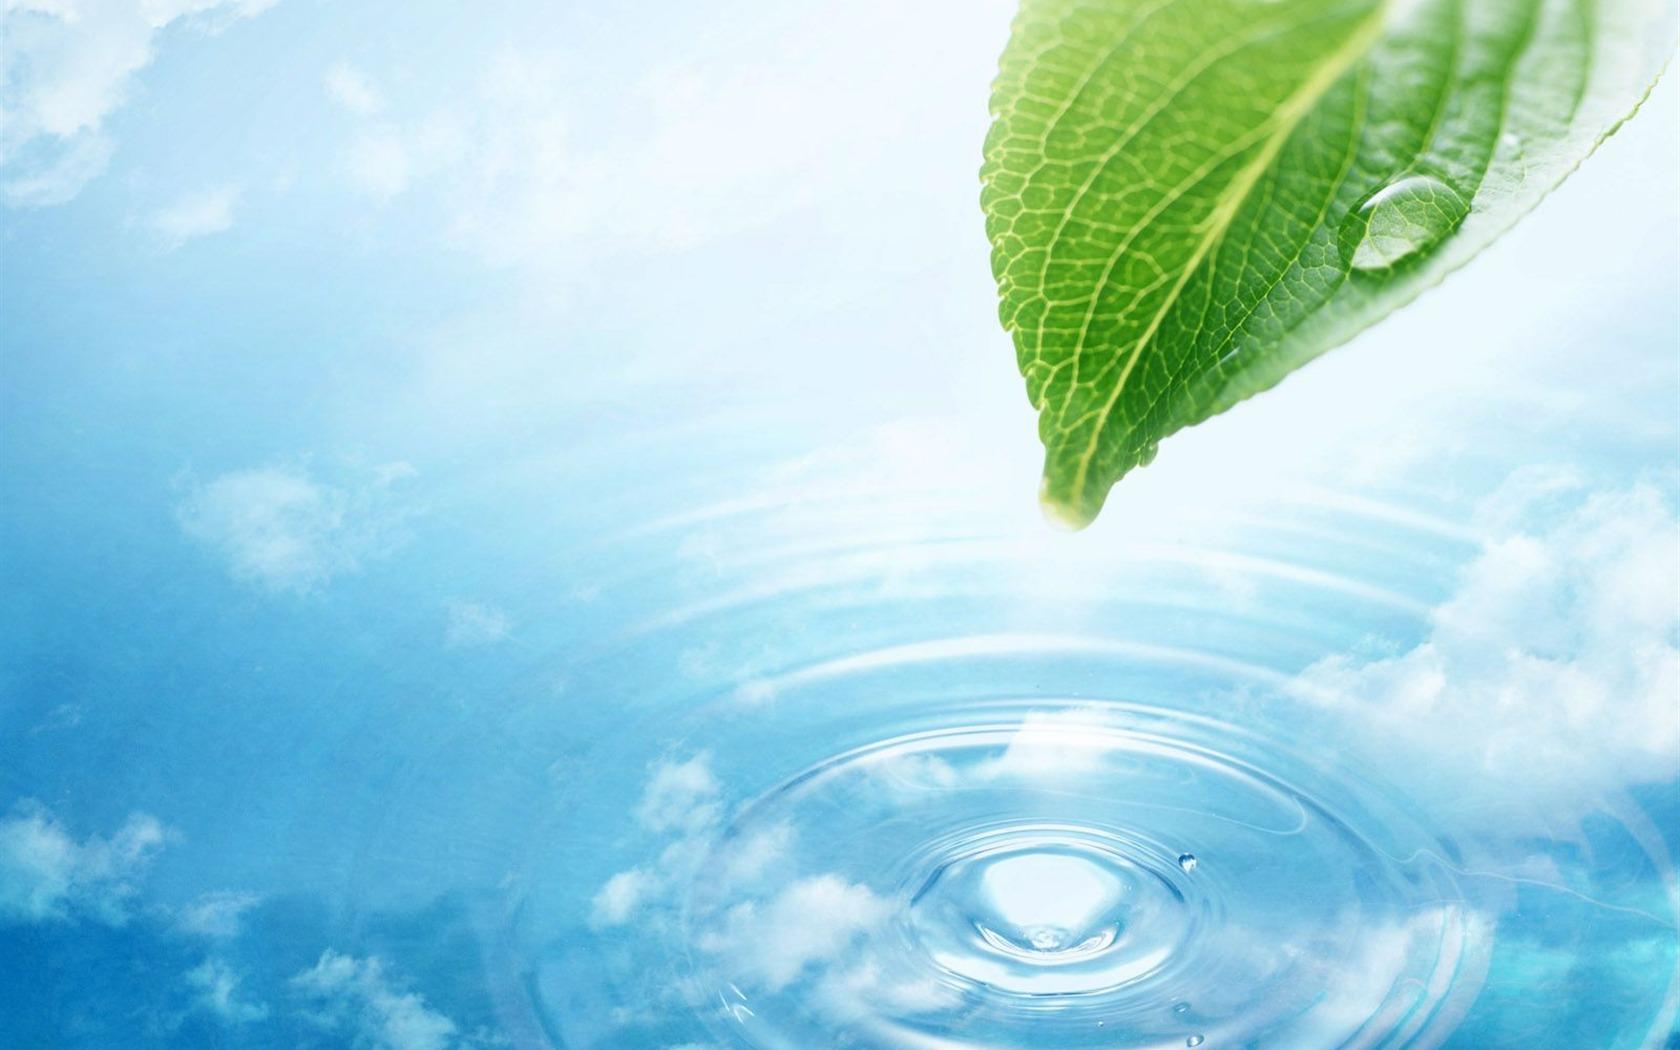 Watermark Fresh Green Leaf Wallpaper 1